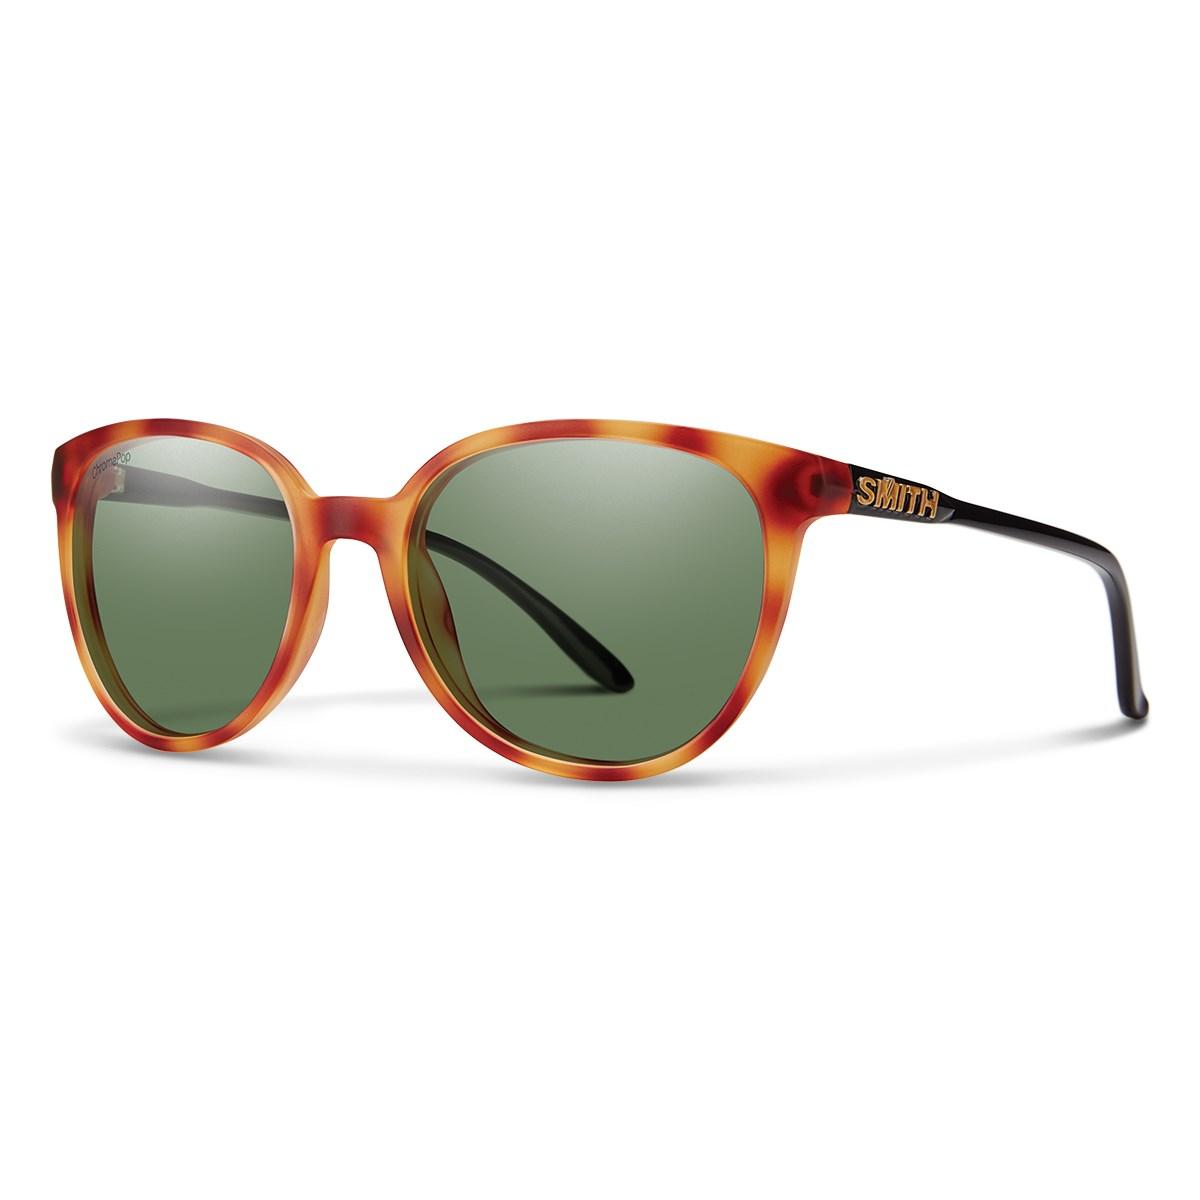 1b135ad61d9 Smith Cheetah Sunglasses - Women s